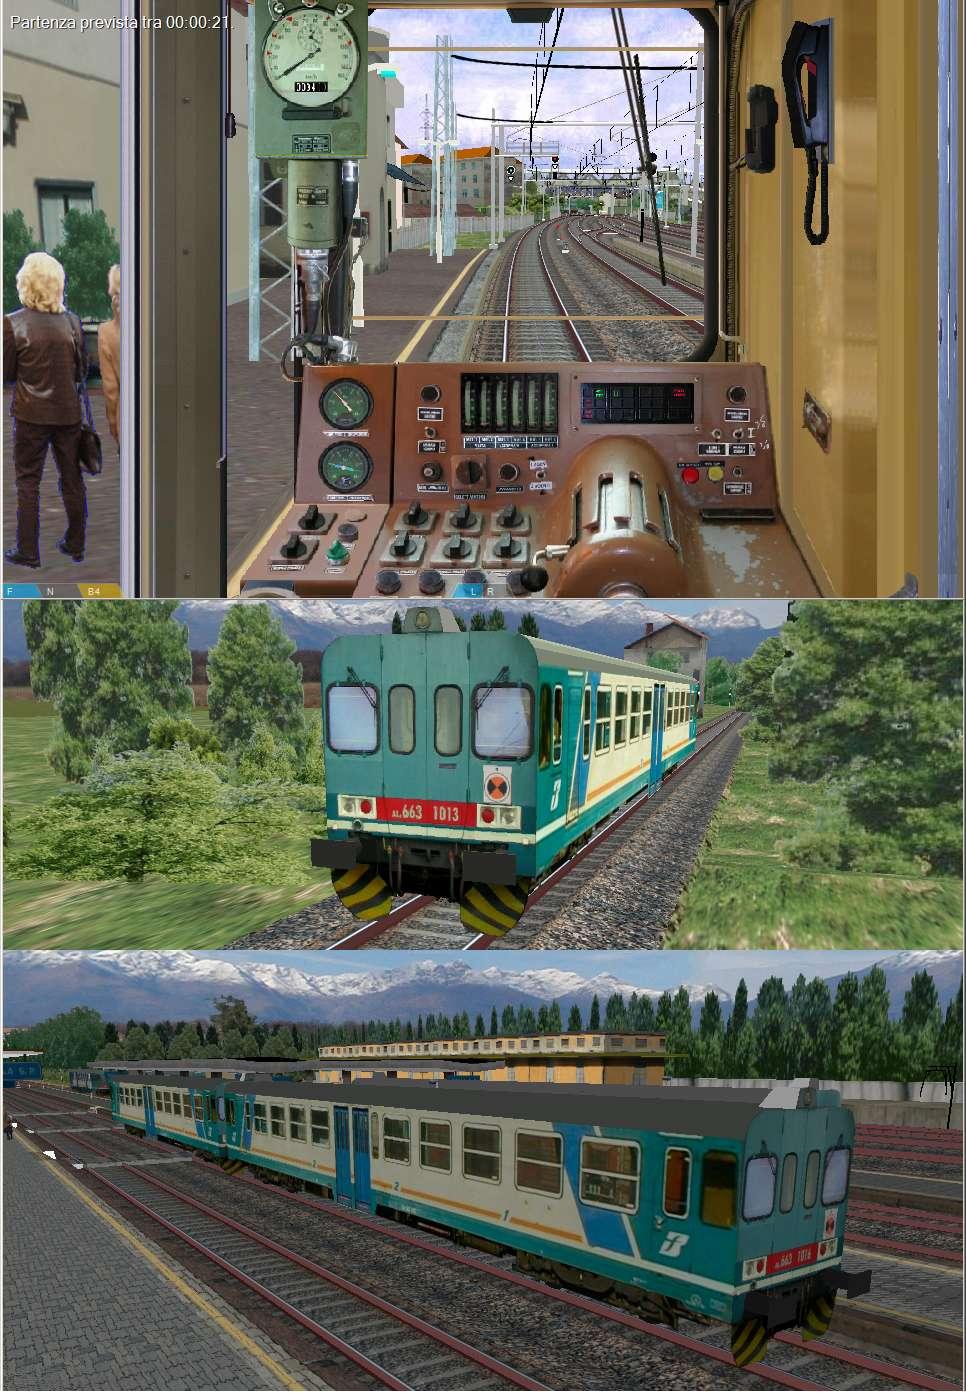 Trenitalia simulatore treno online dating